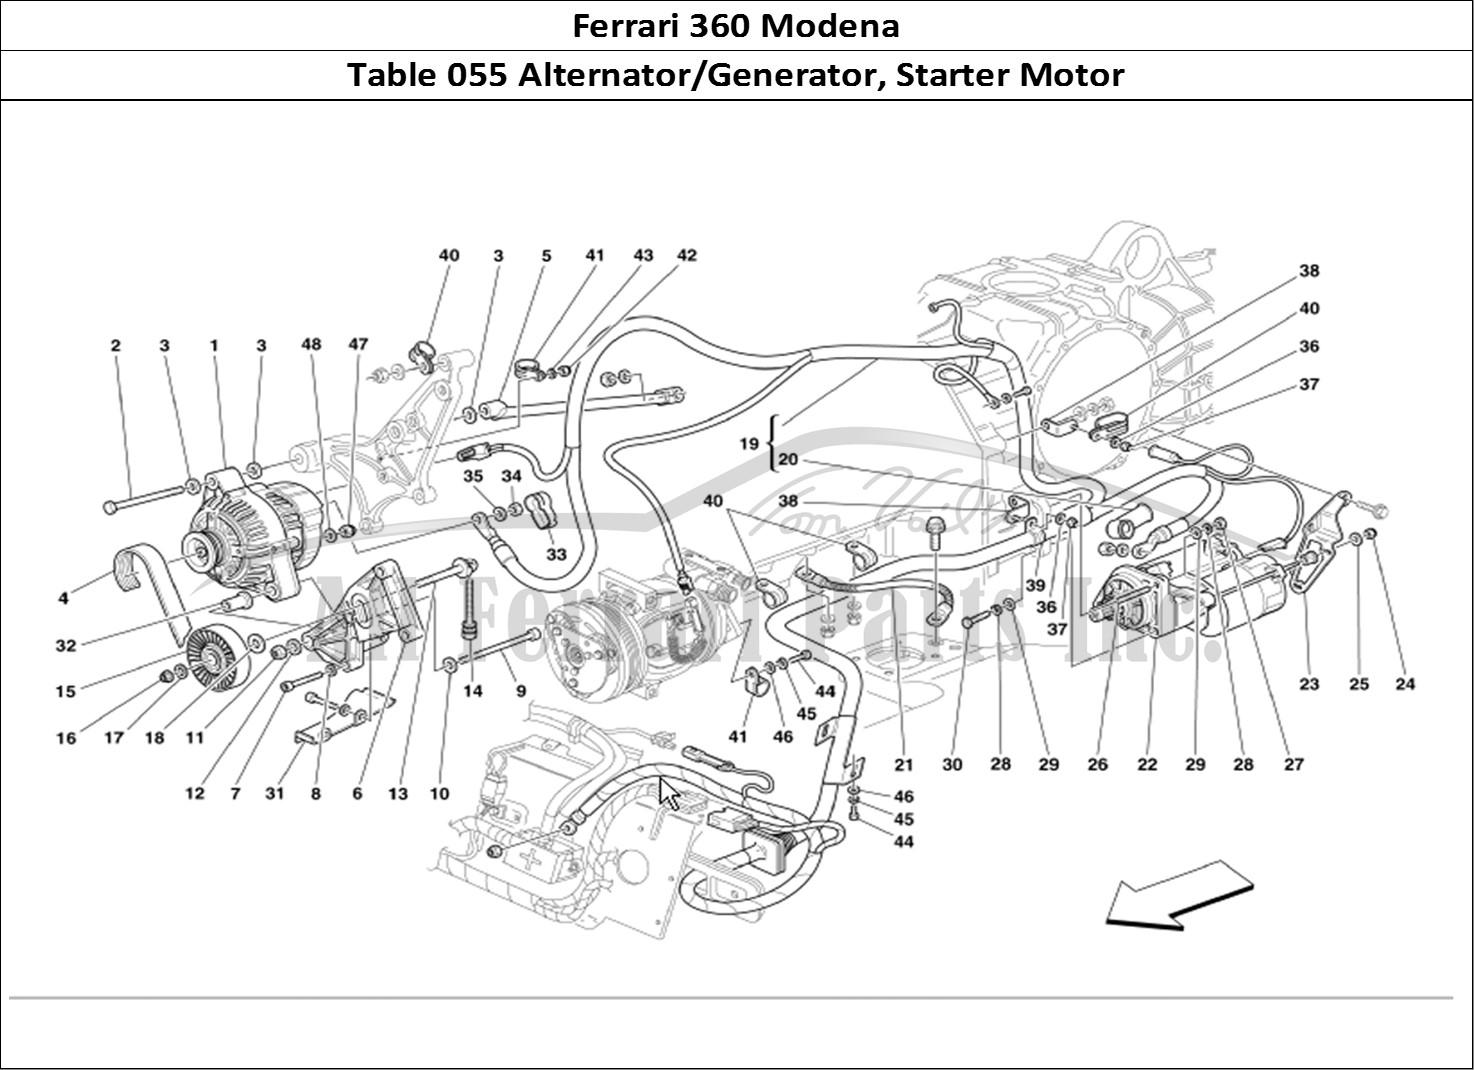 Buy original Ferrari 360 Modena 055 Alternator/Generator